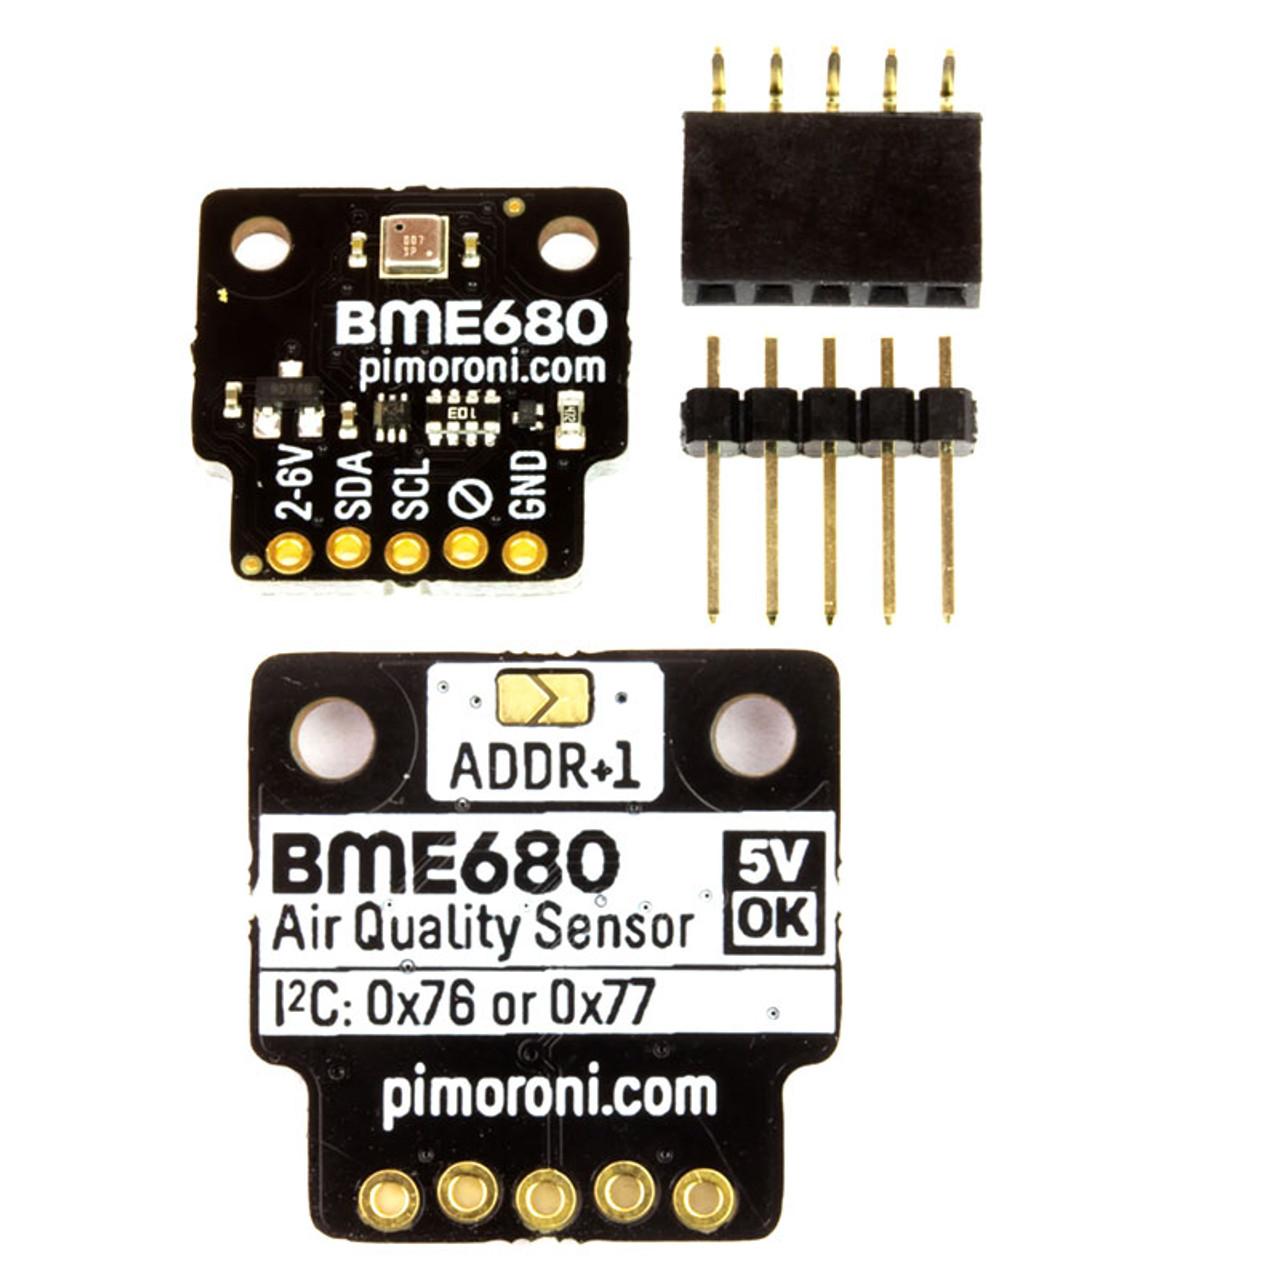 Air Quality Temperature Pressure Humidity Sensor BME680 Breakout